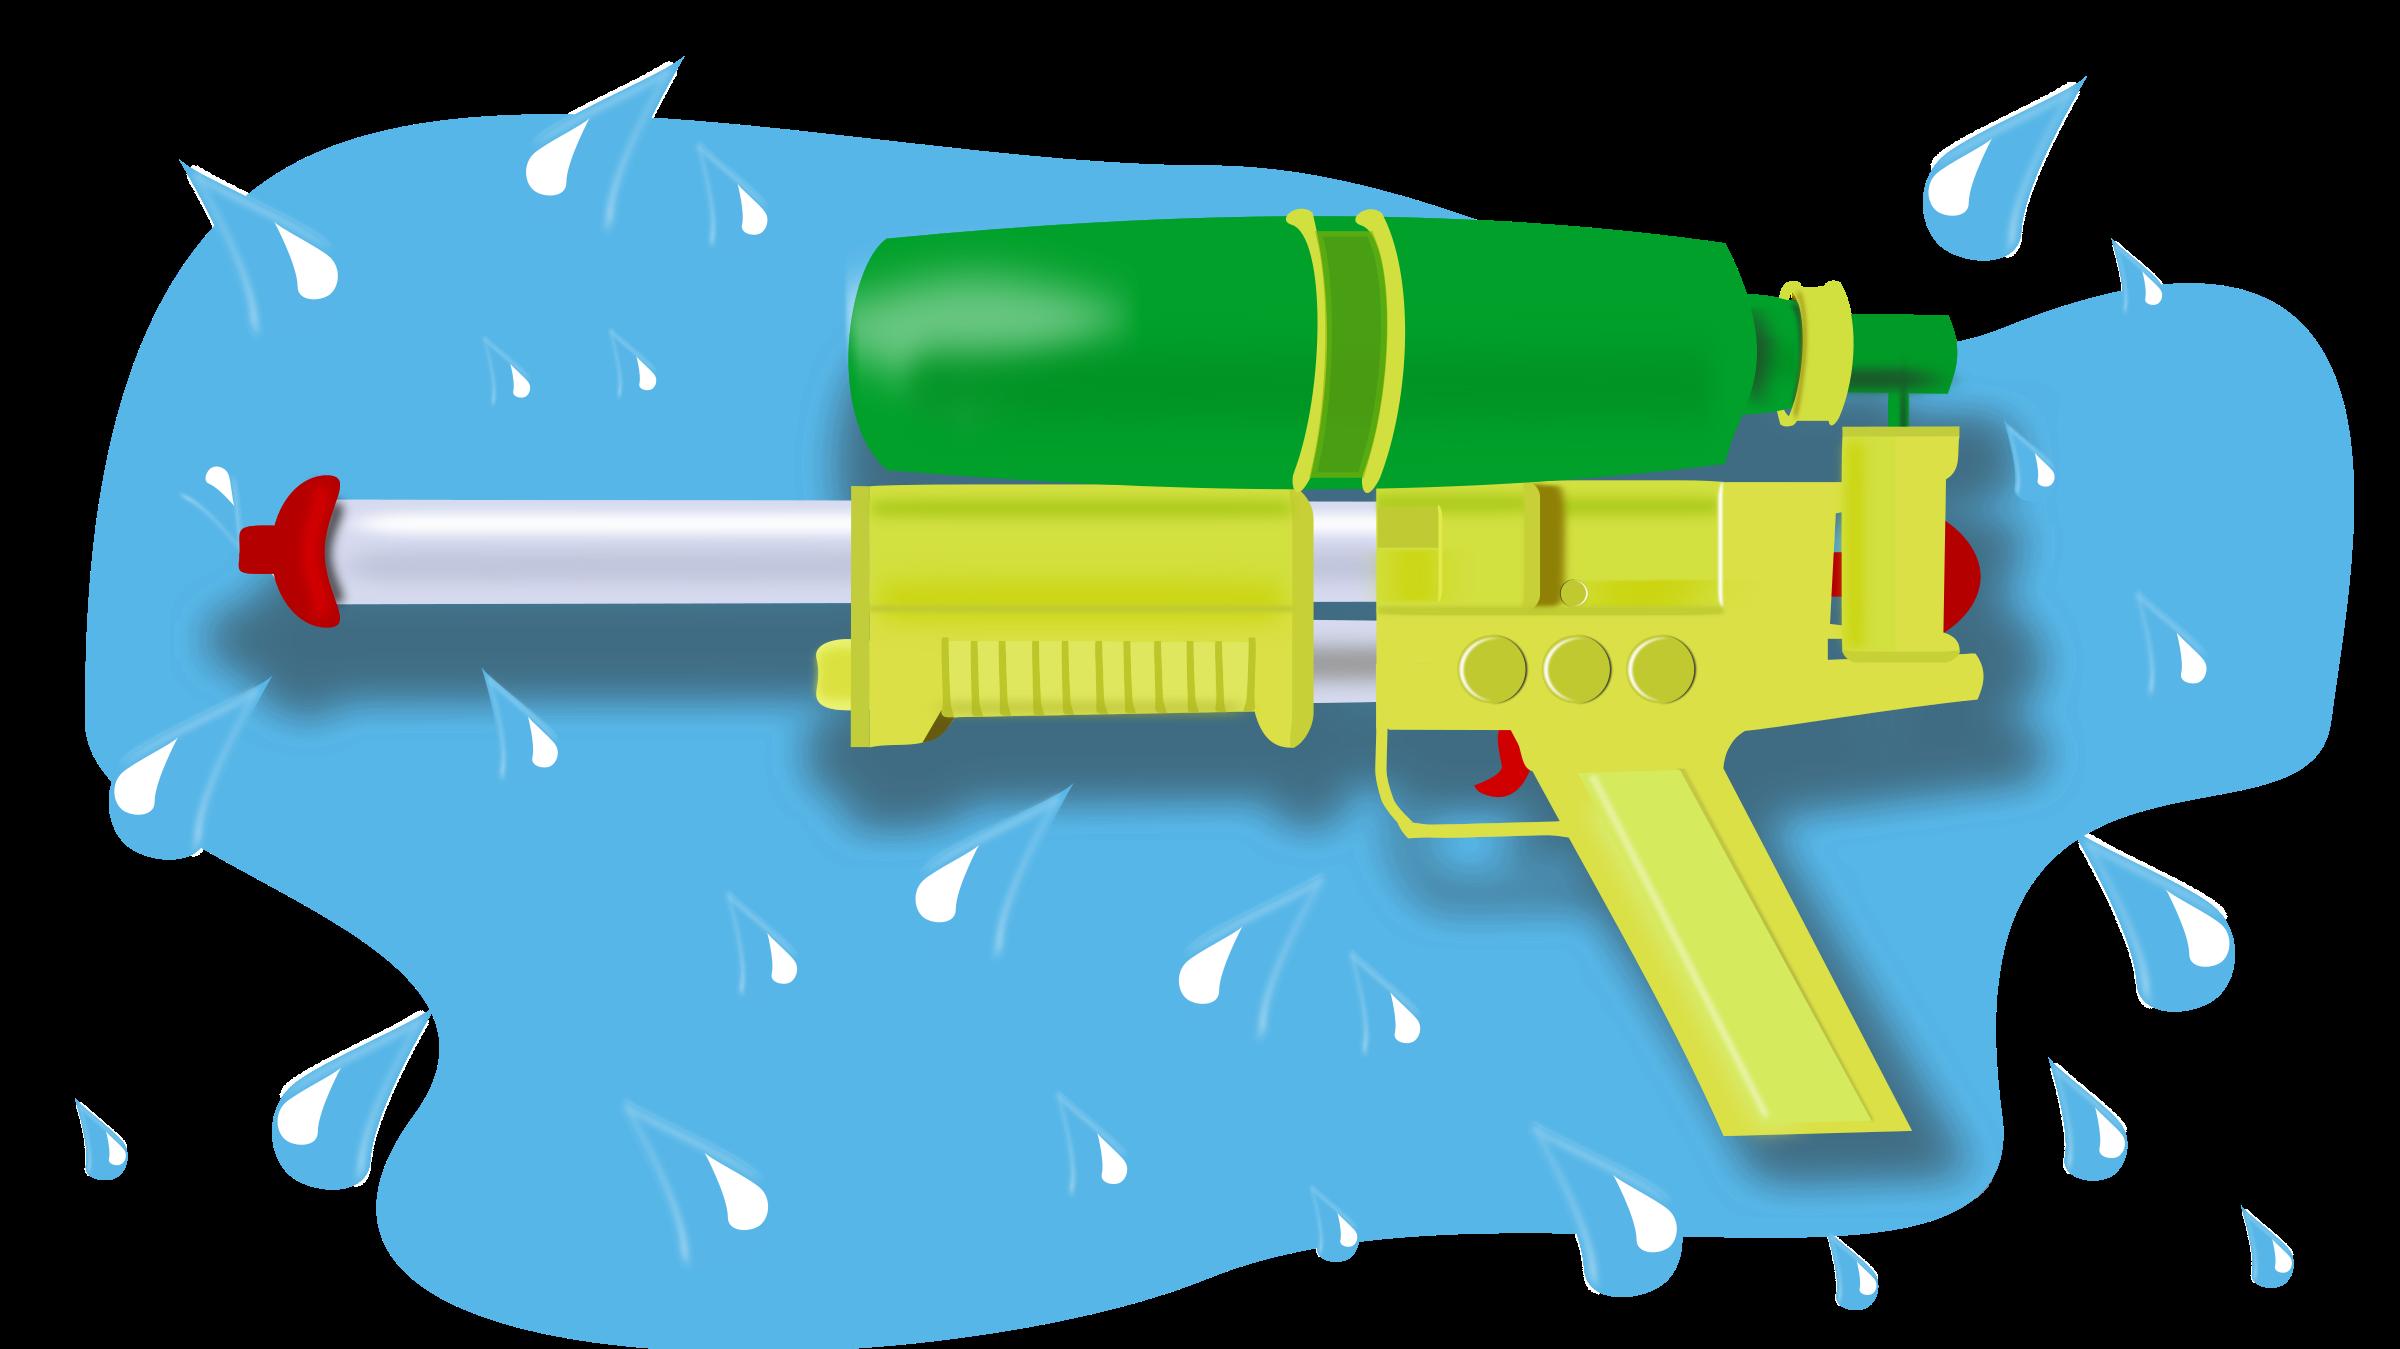 Splash gun big image. Clipart summer water